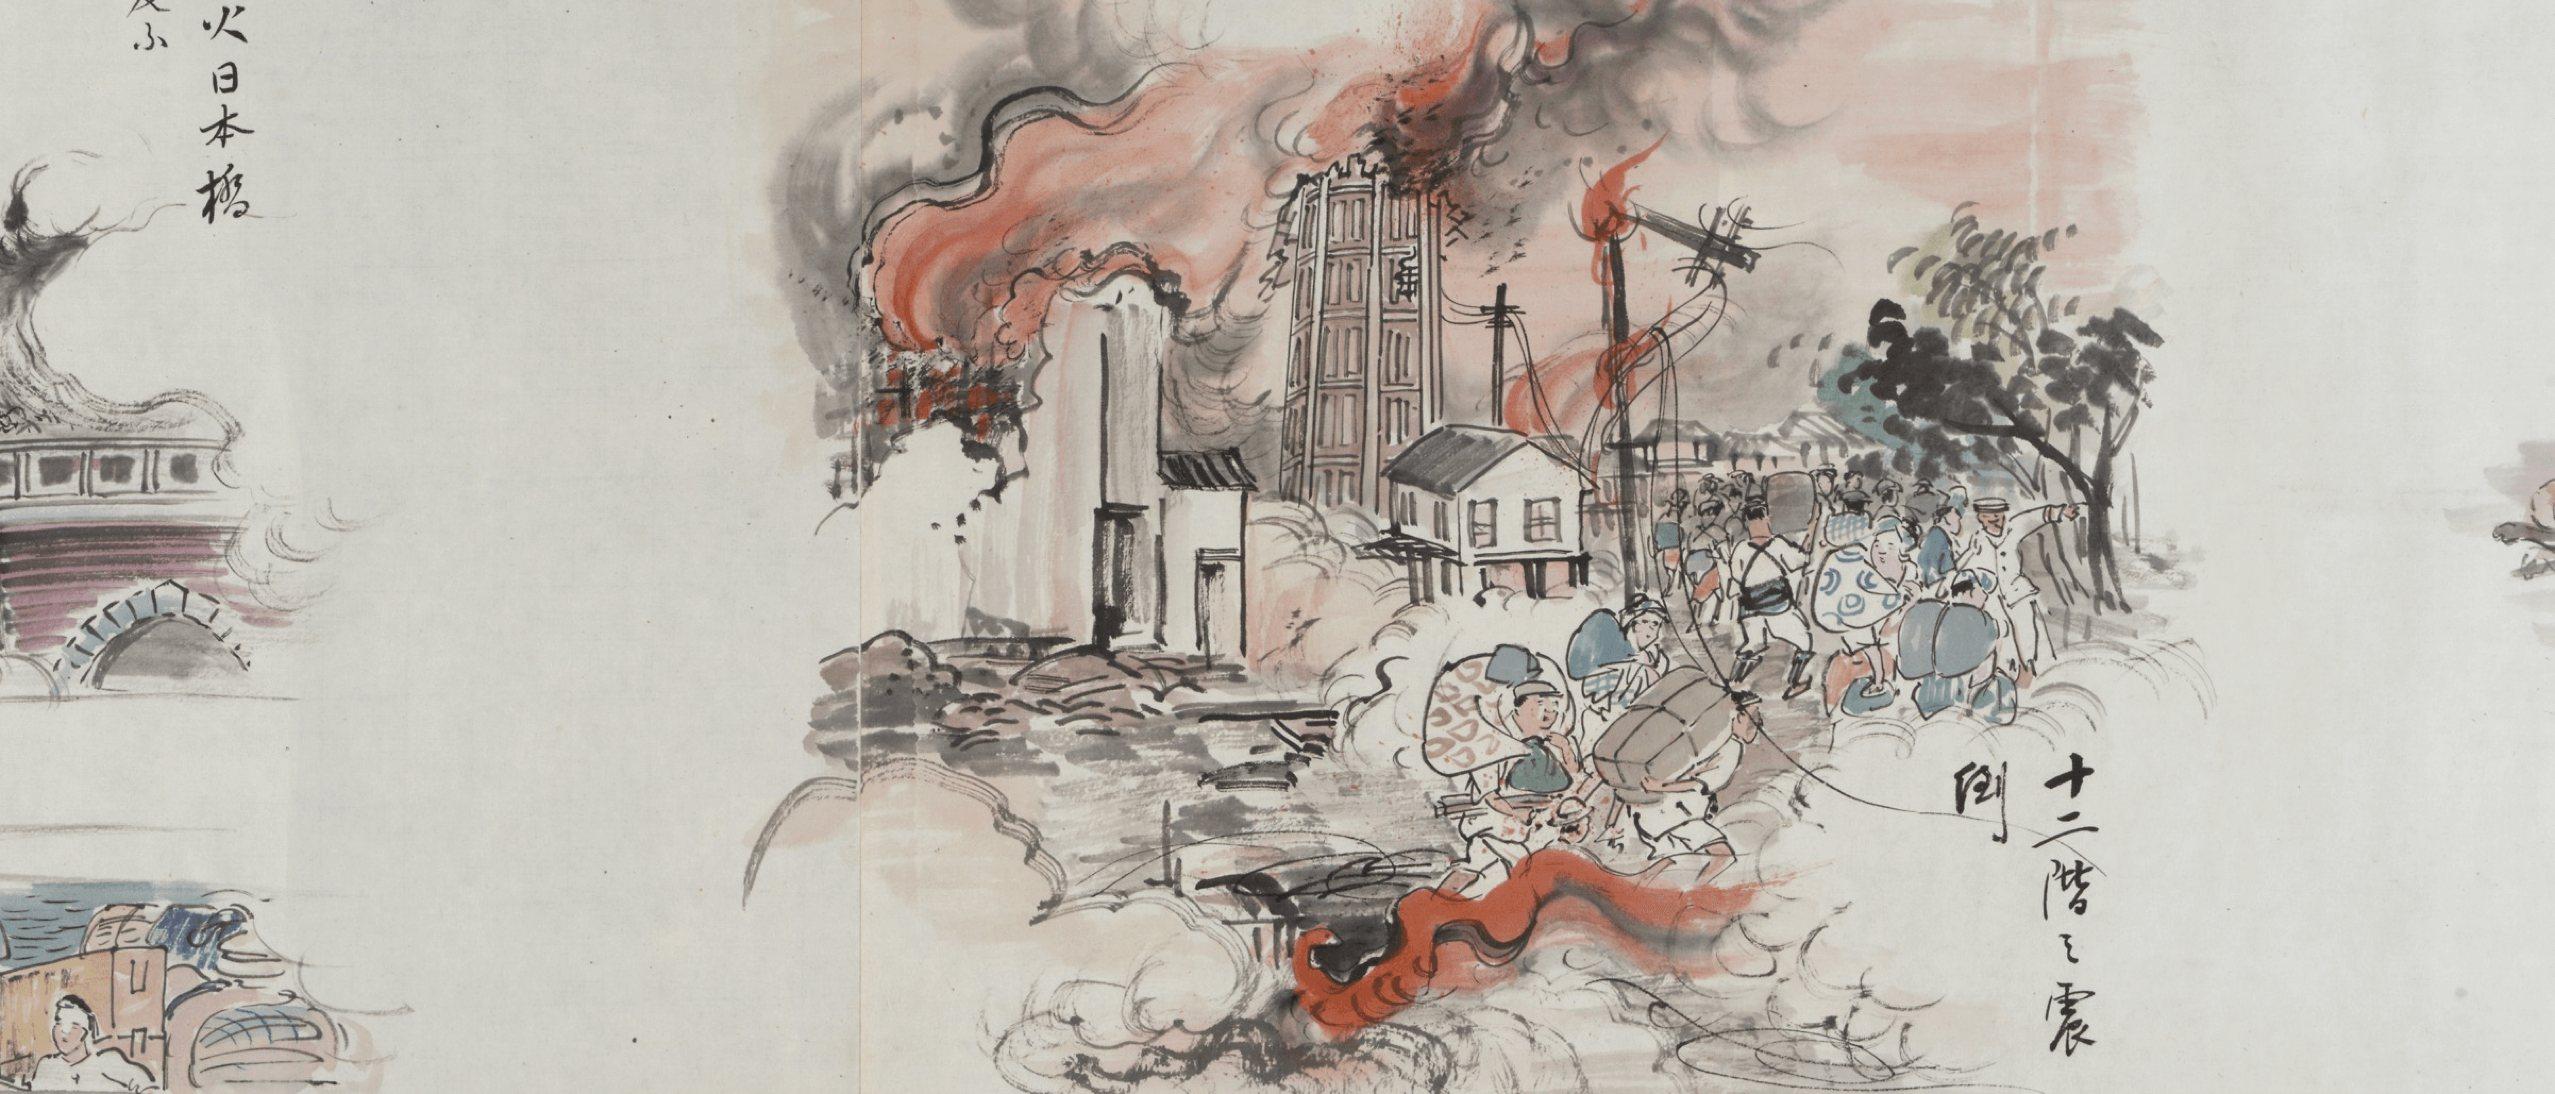 Scenes of the 1923 Earthquake